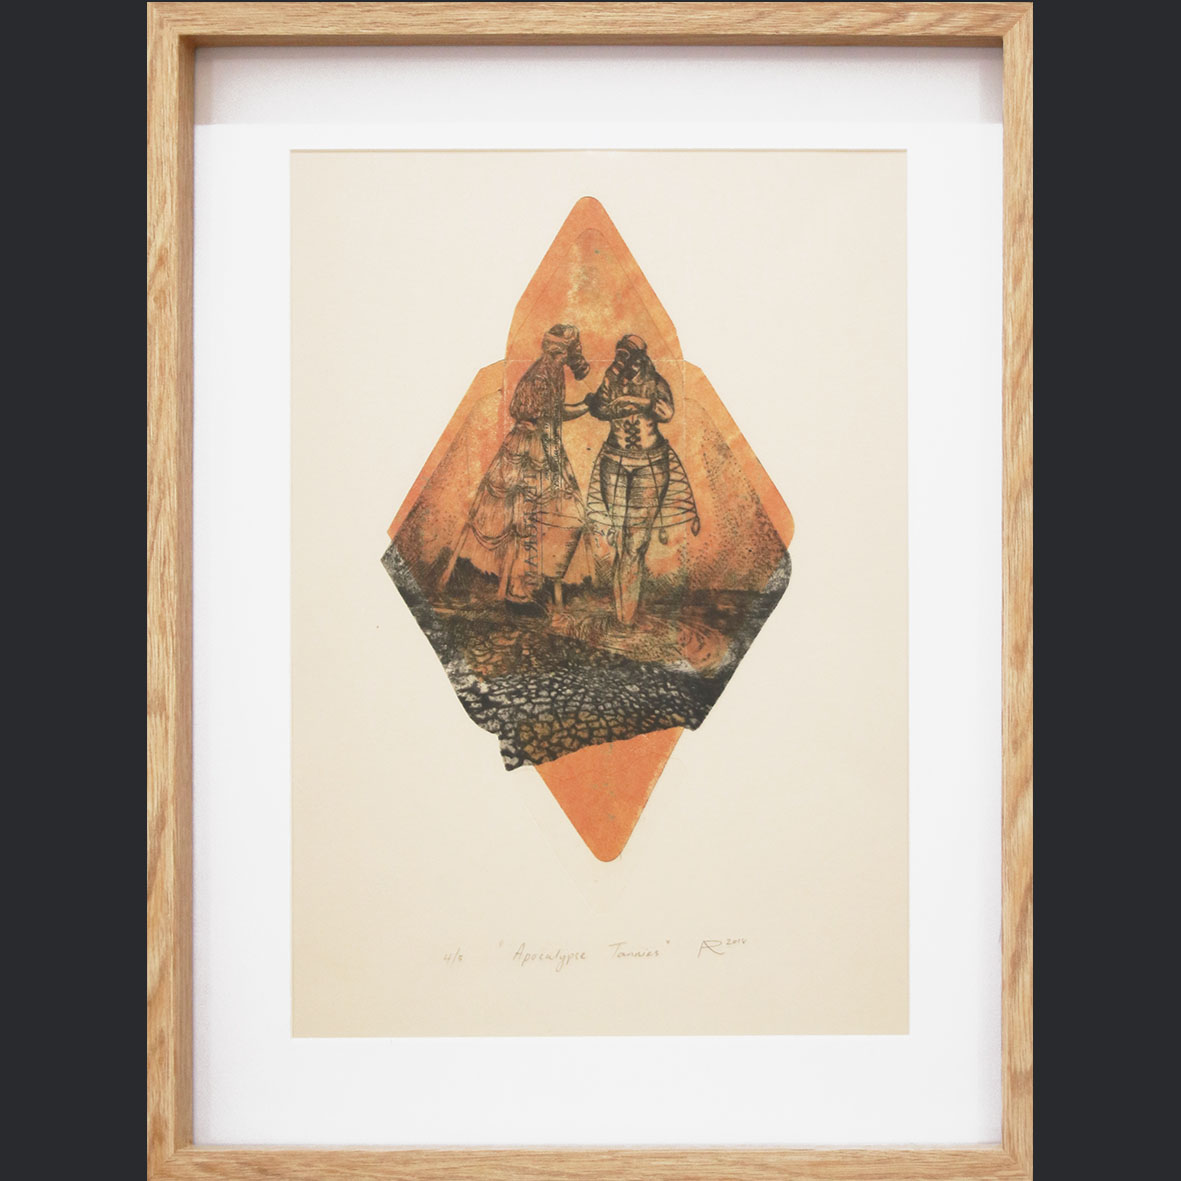 Adrian Ranger, Apocolapse Tannies - 4 of 5, 2018, Hyprid Print, 42.5 x 52.5 cm